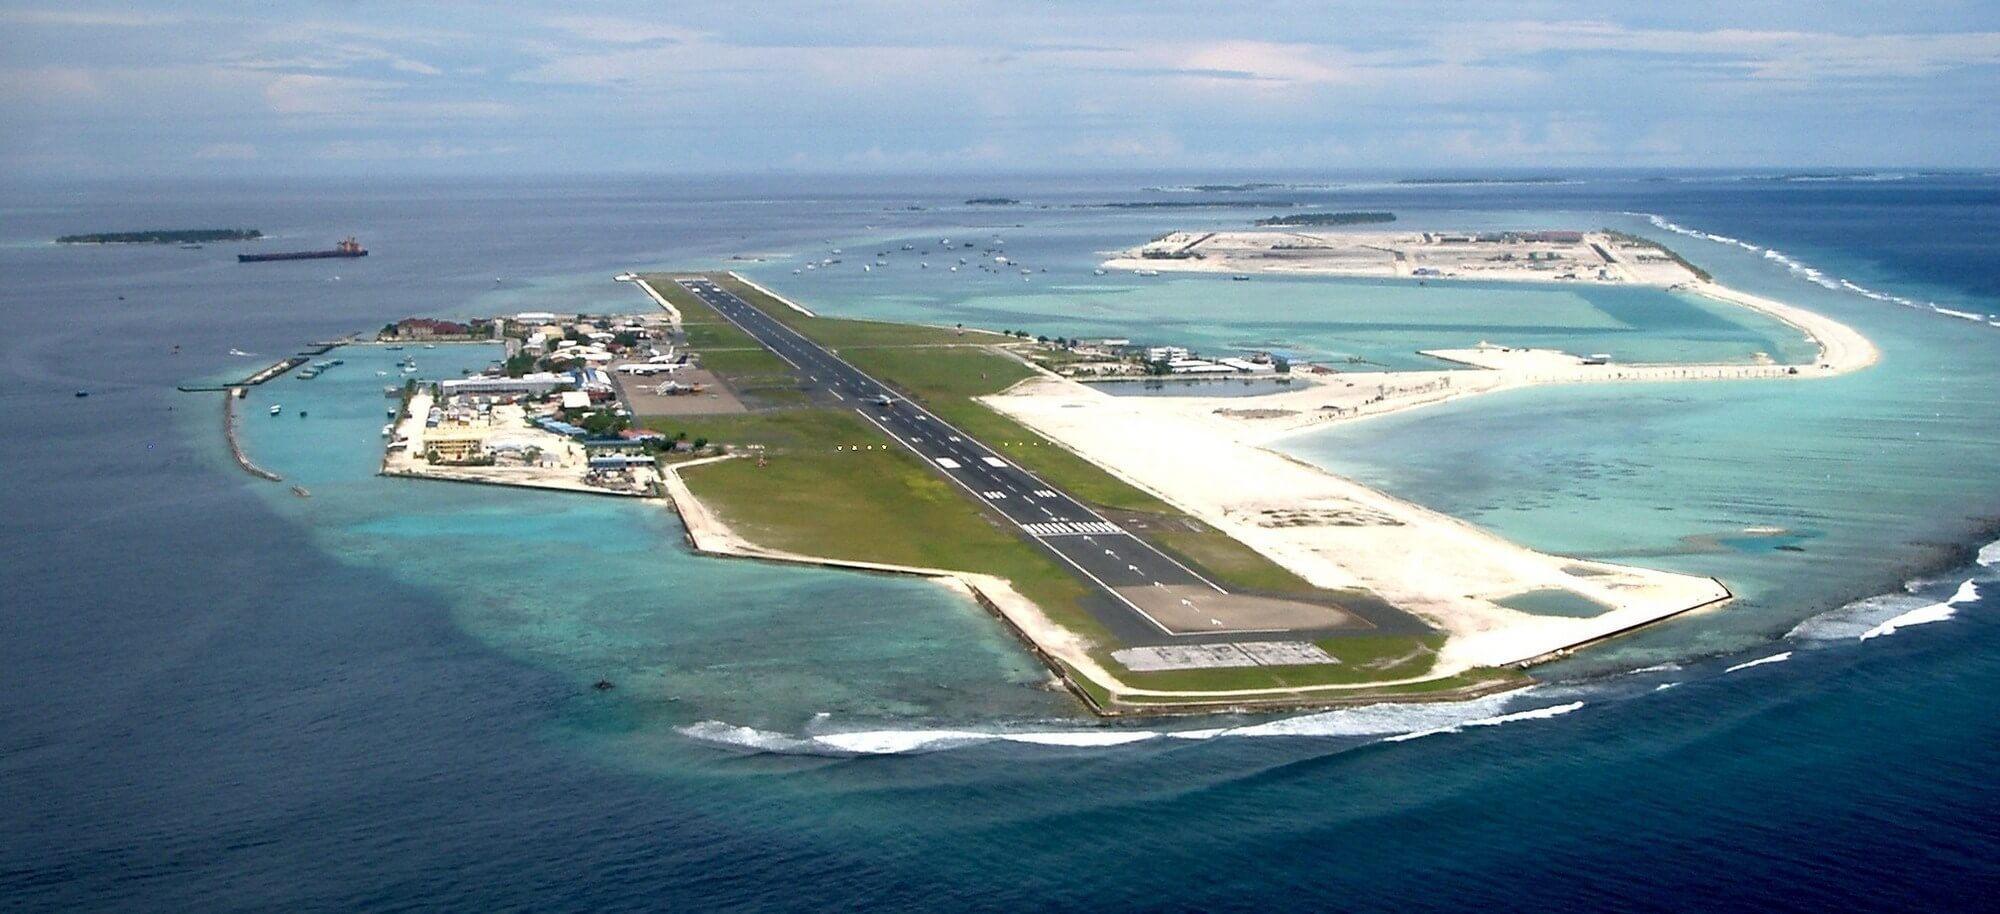 theawesomedailycom-hulhule_island-5718b9c3c58e5 (1)